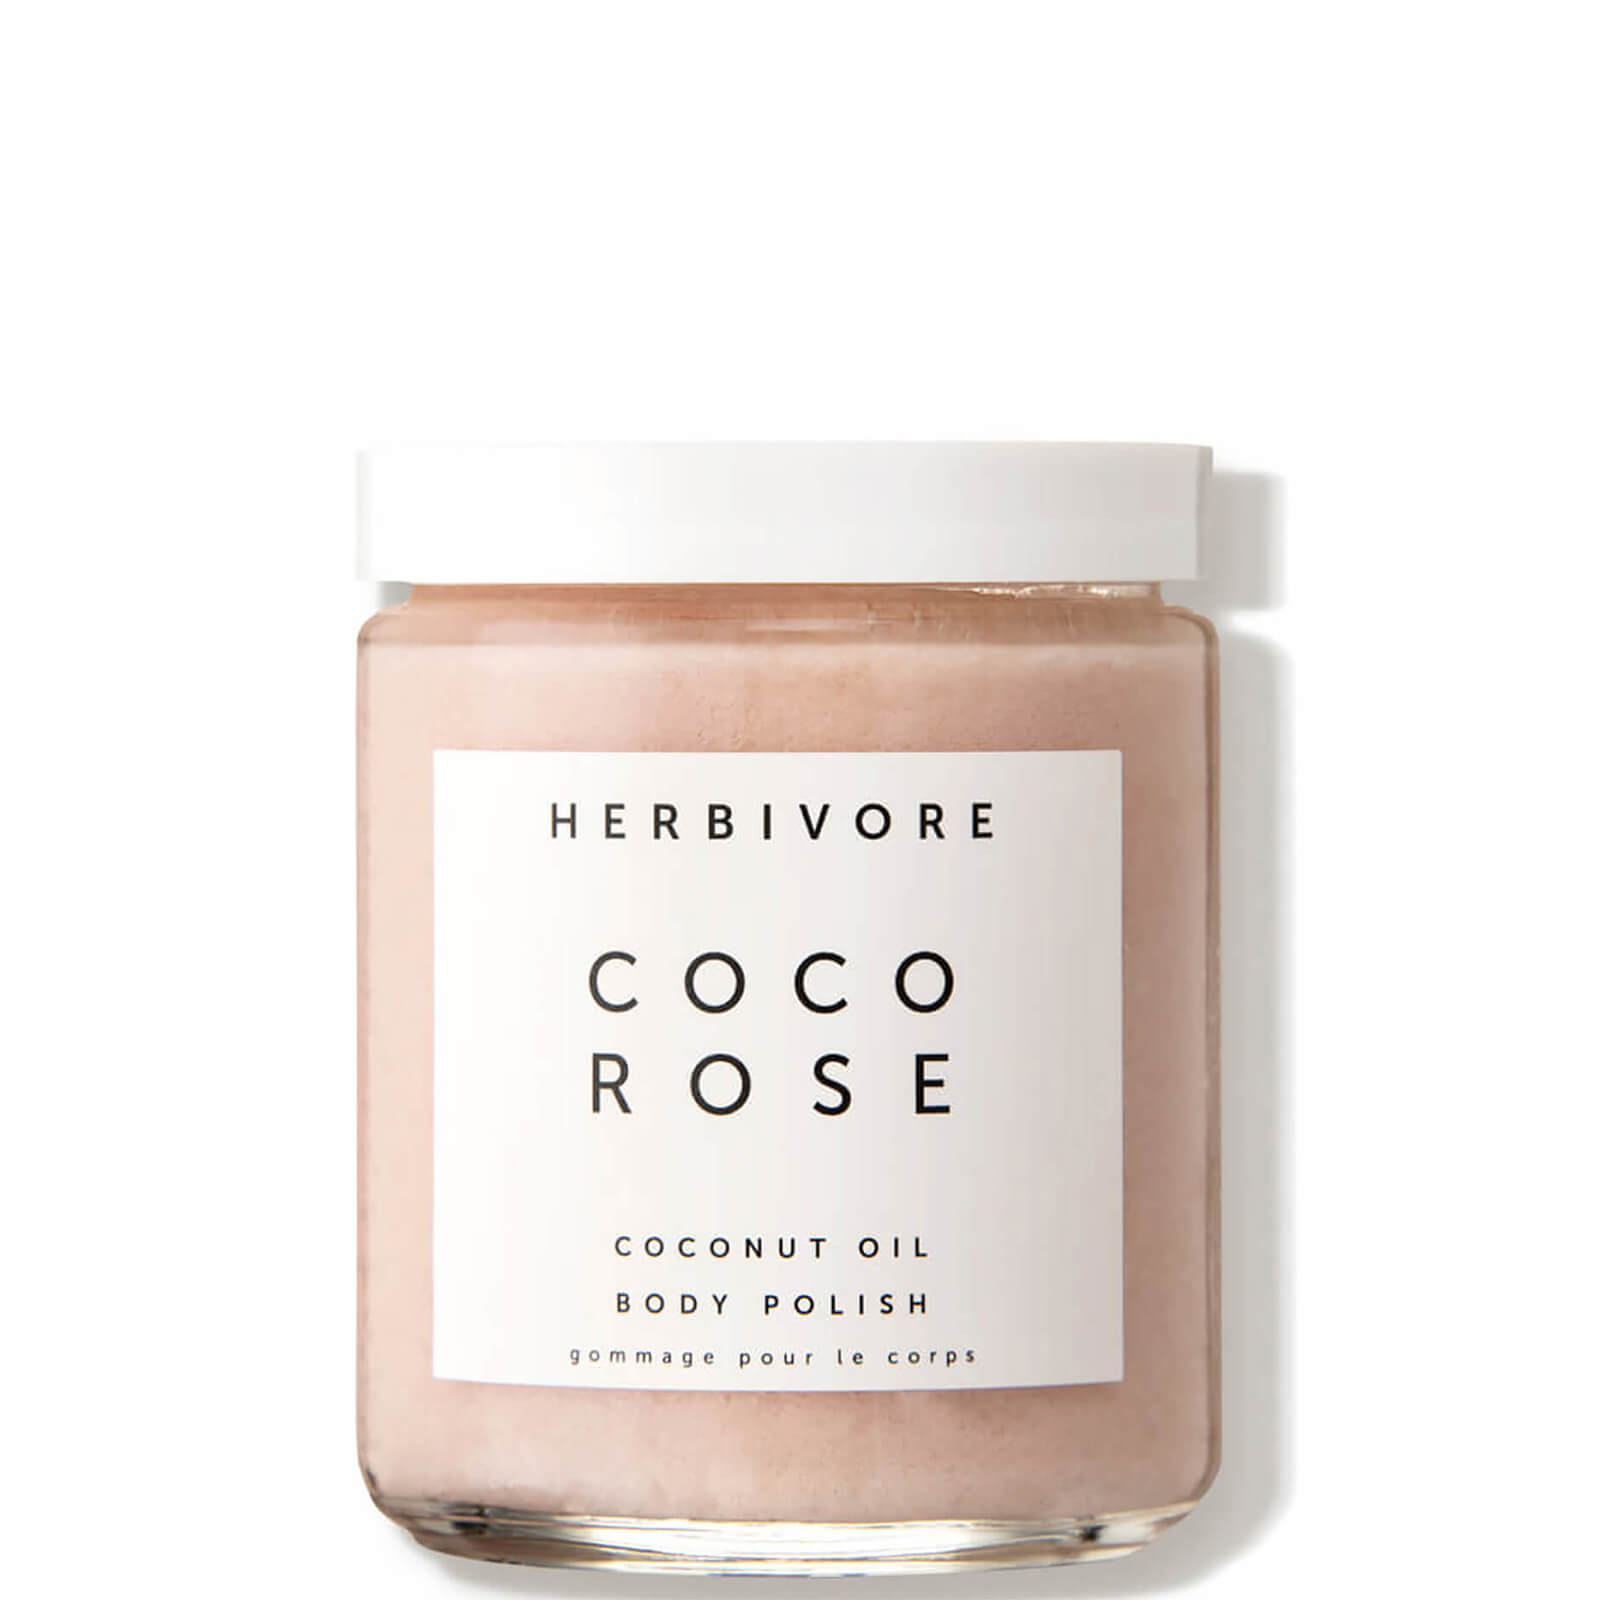 Купить Herbivore Coco Rose Coconut Oil Body Polish 226g